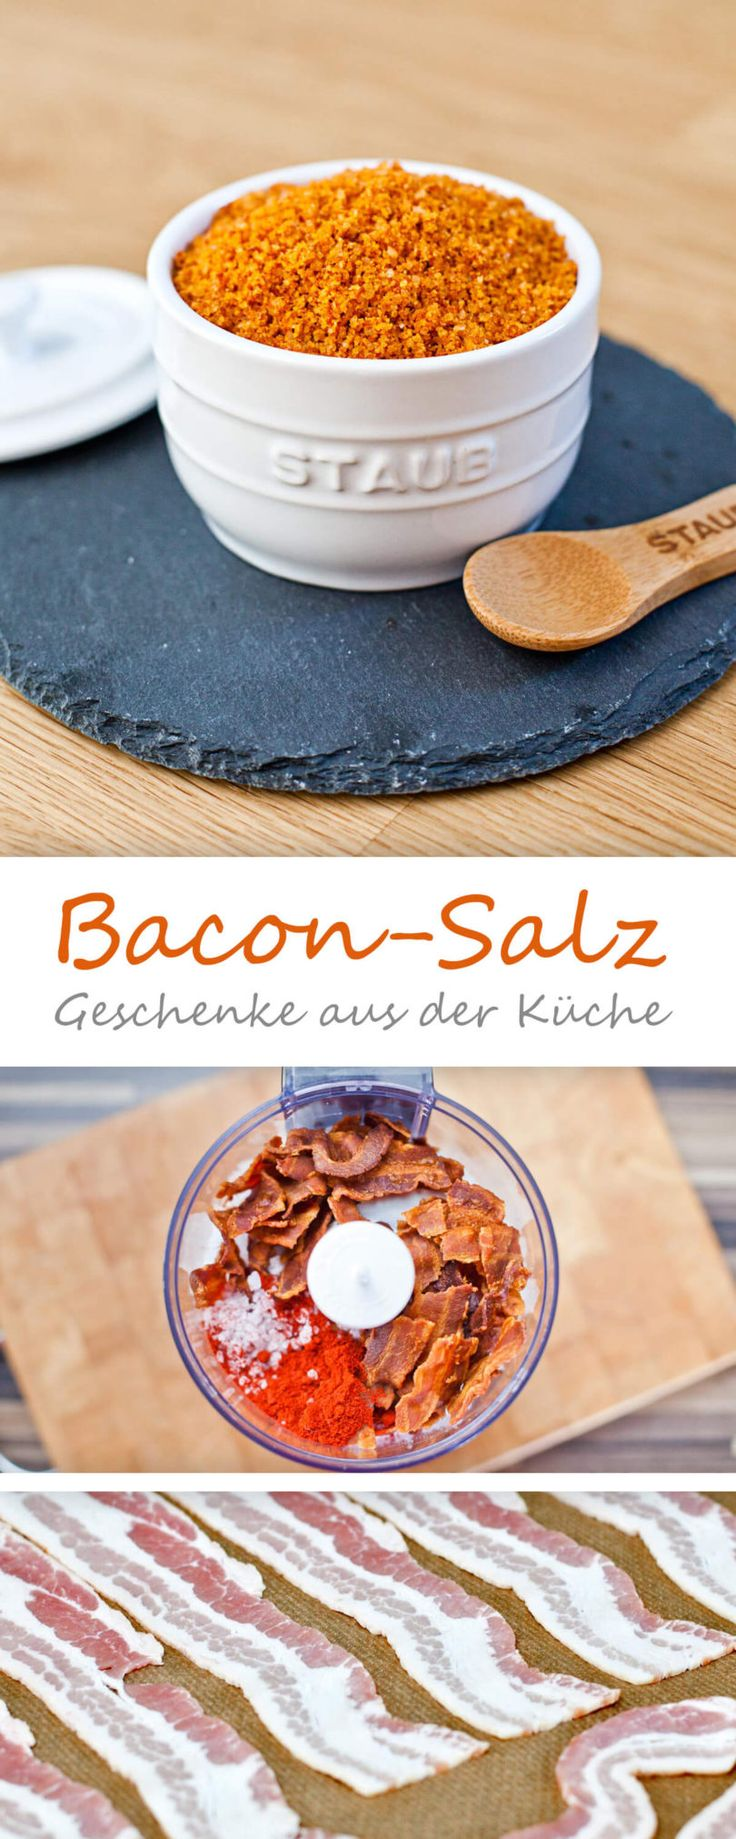 Bacon-Salz grundrezept